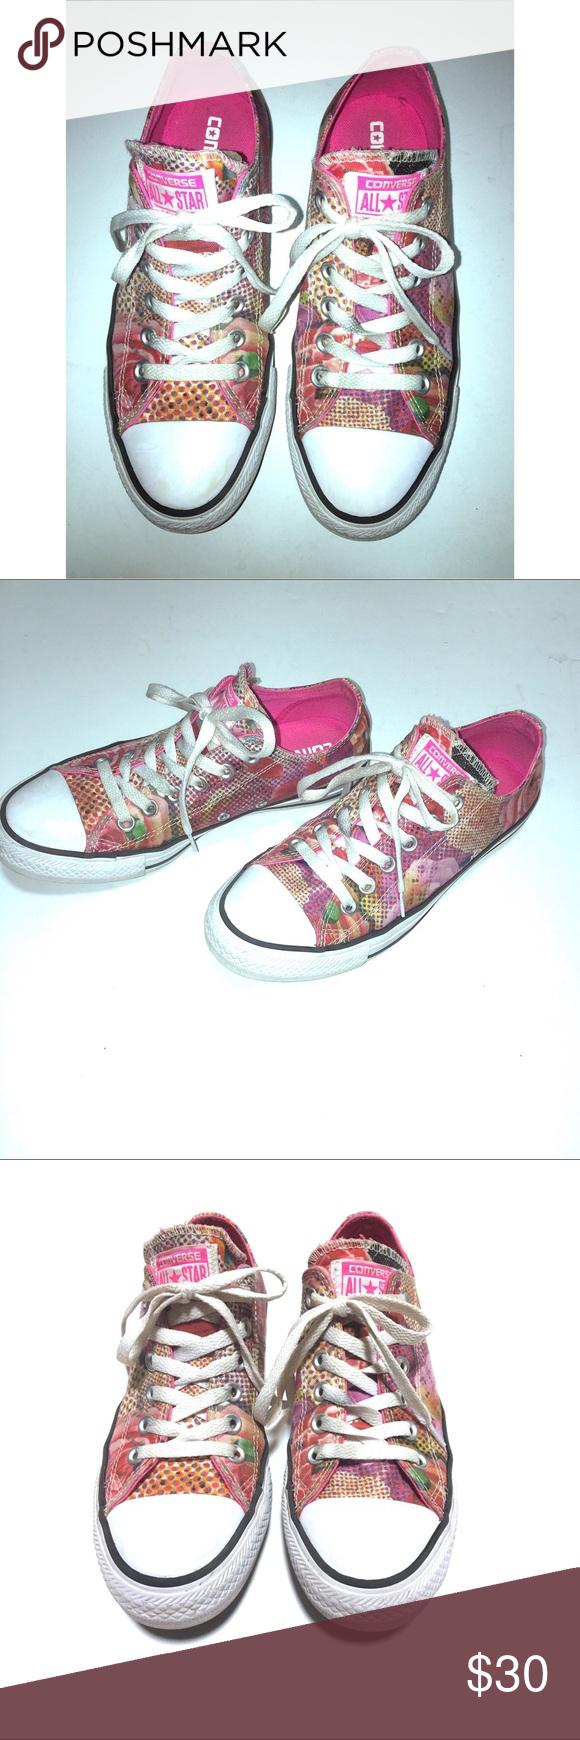 3dbc0e3cc116 Converse Chuck Taylor All Star Floral Sneakers Sz7 Converse Chuck Taylor  All Star Sneakers. •